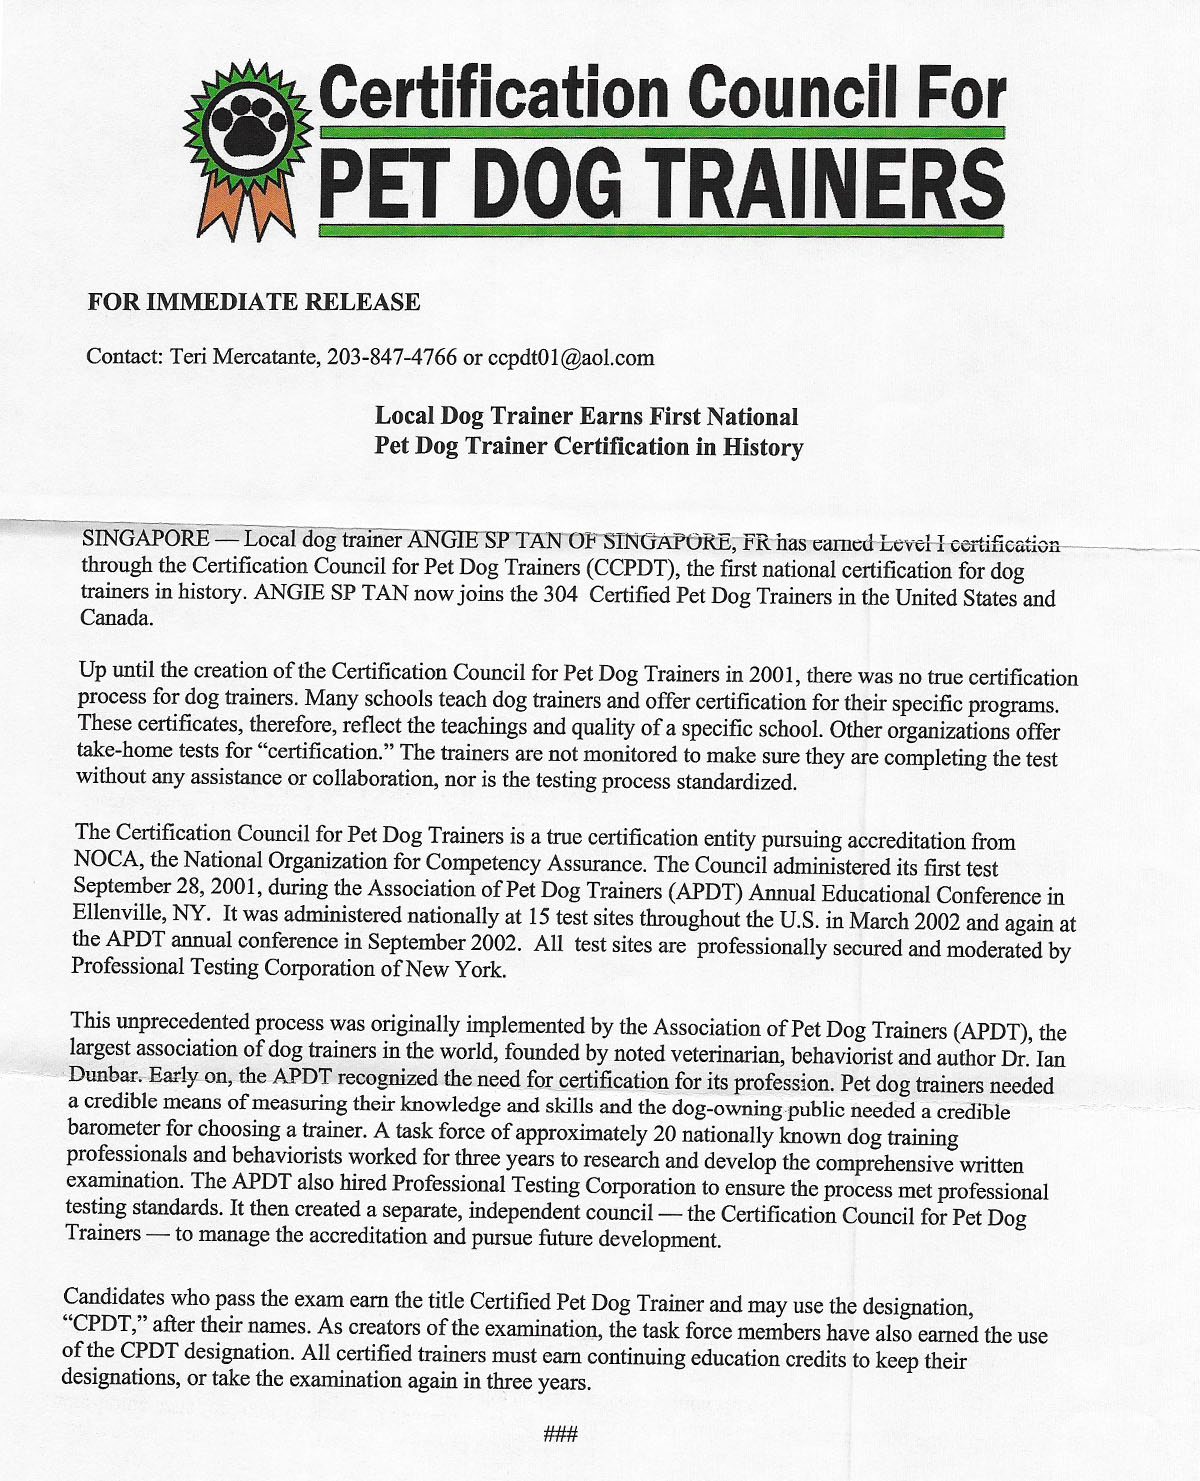 CCPDT press release